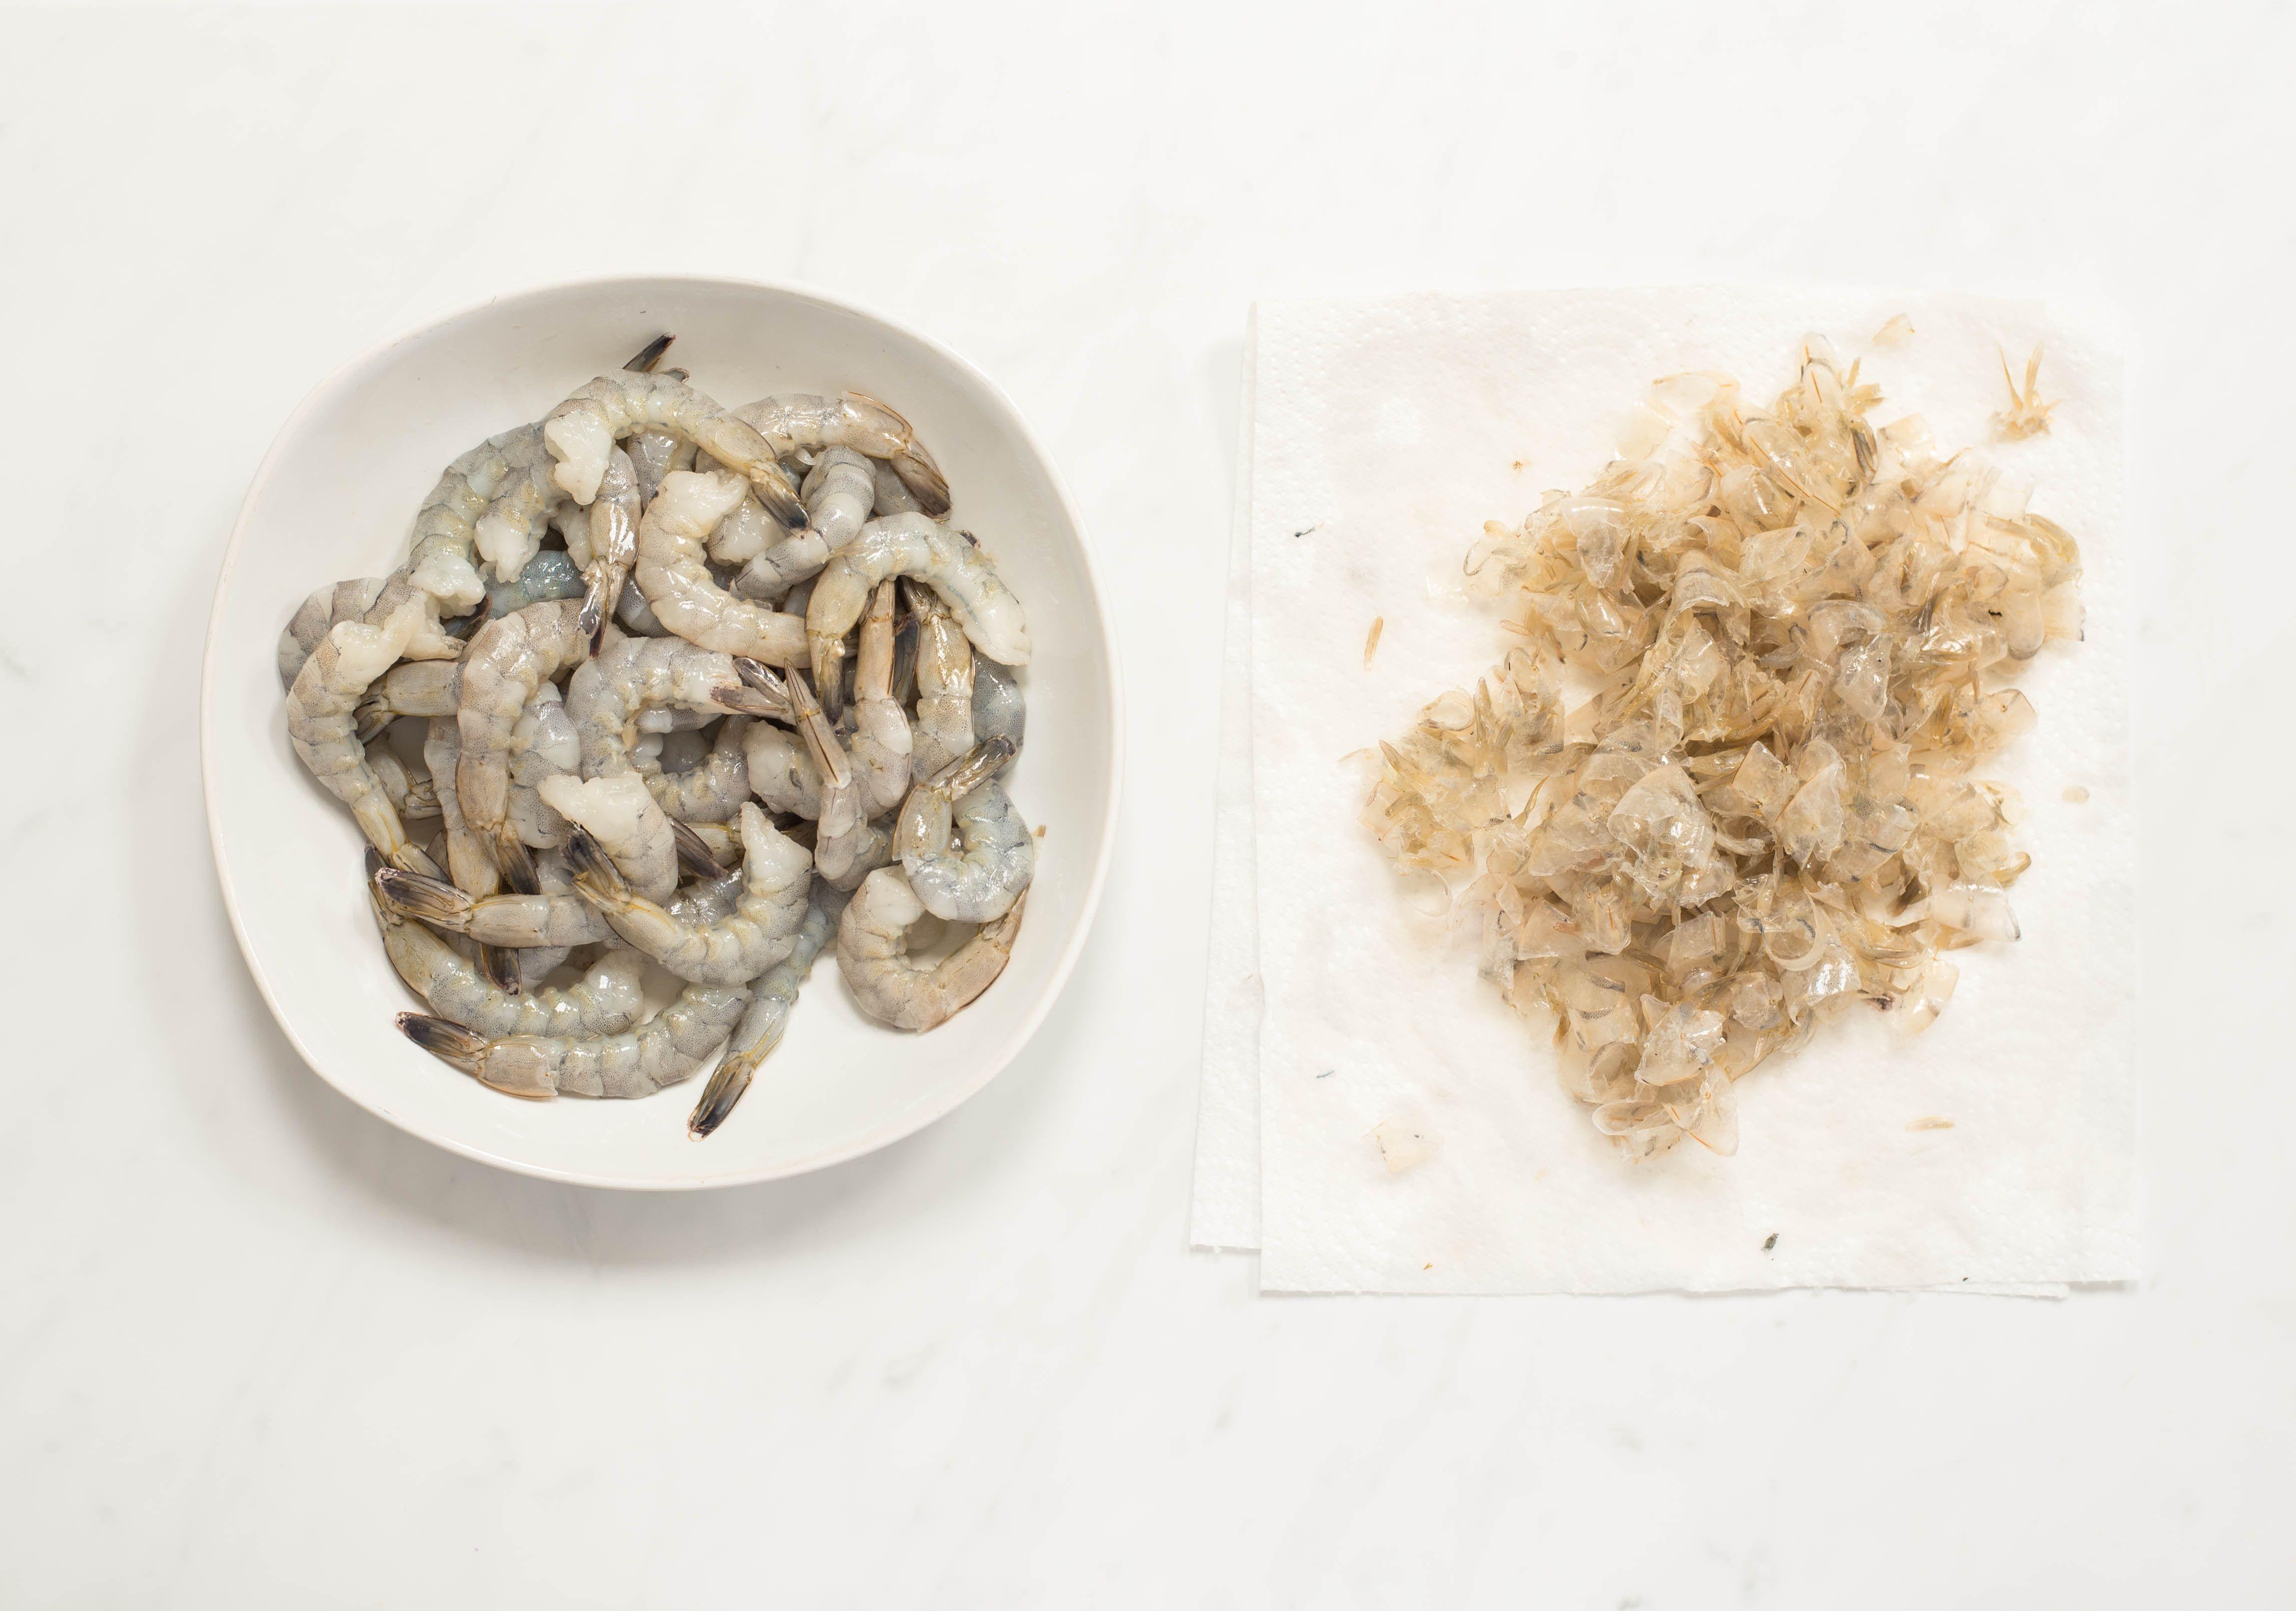 Peel the shrimp